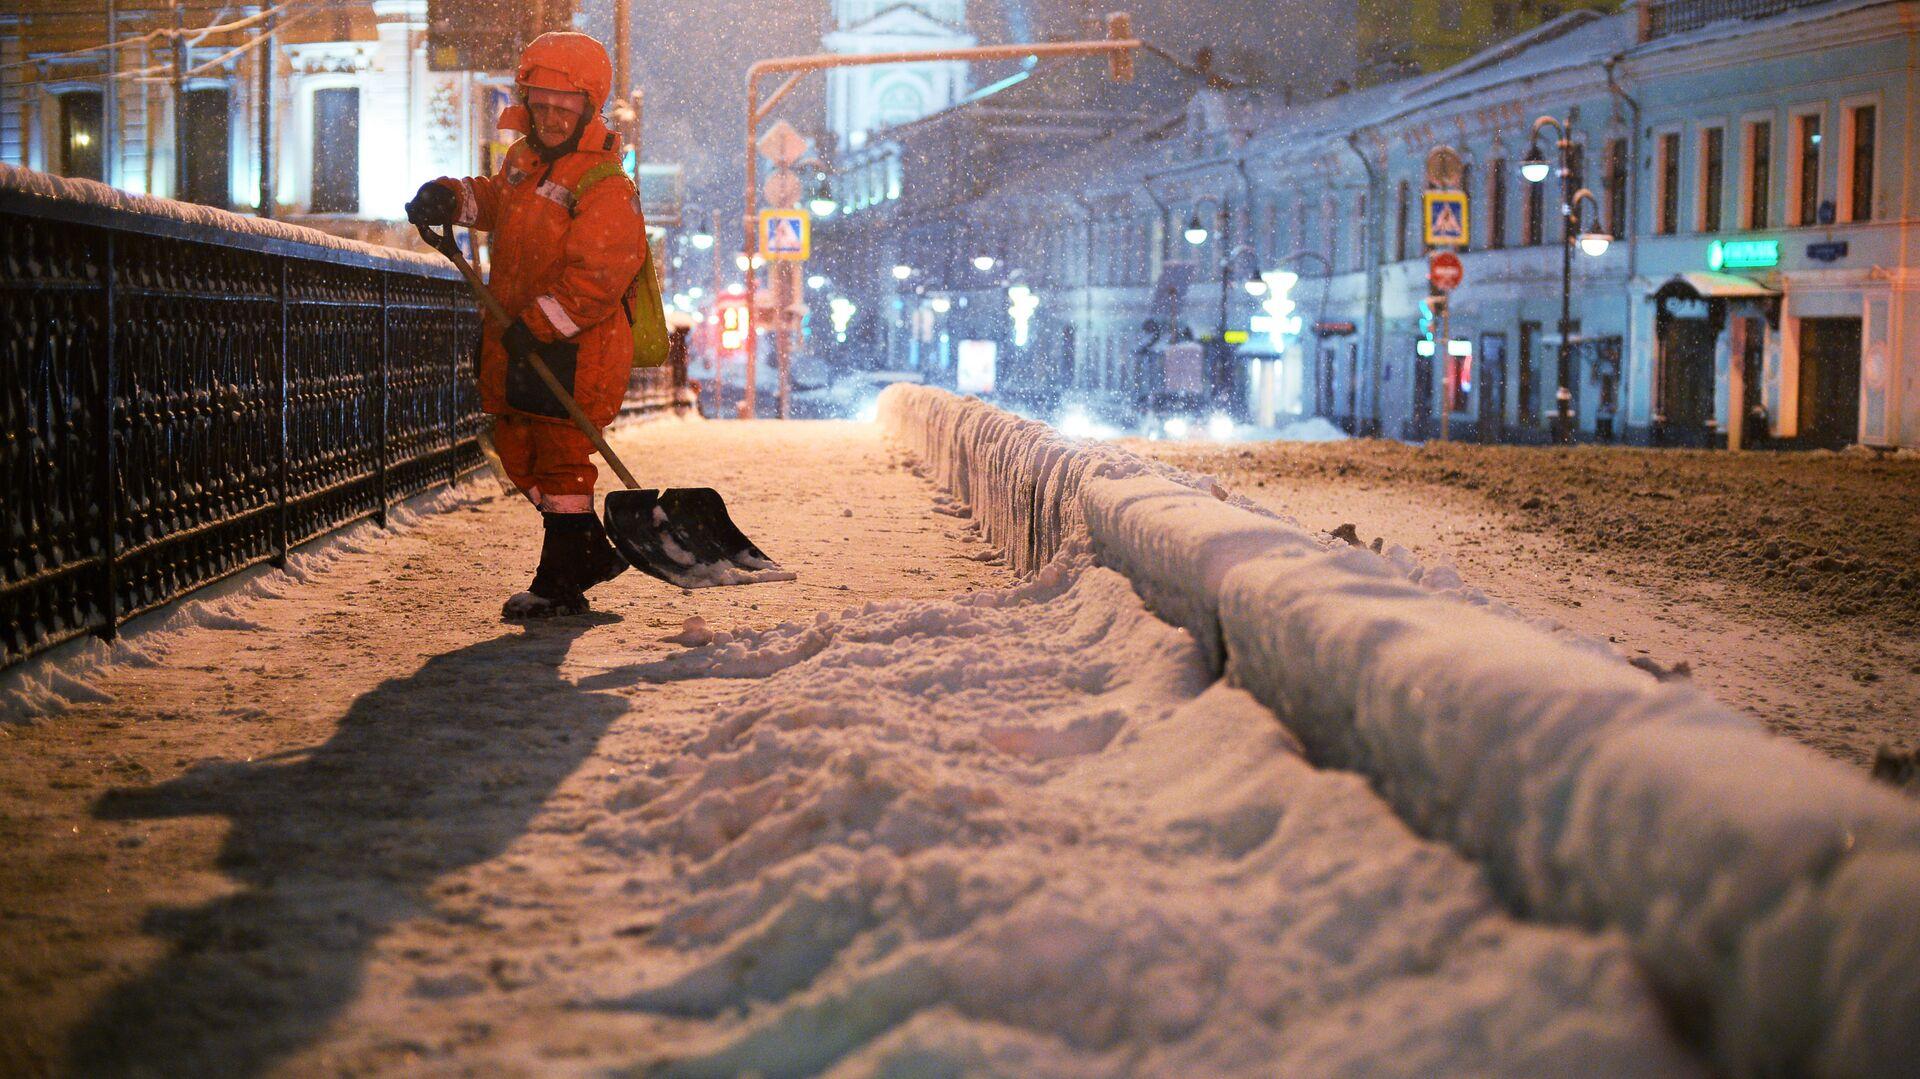 Уборка снега в Москве - РИА Новости, 1920, 14.01.2021